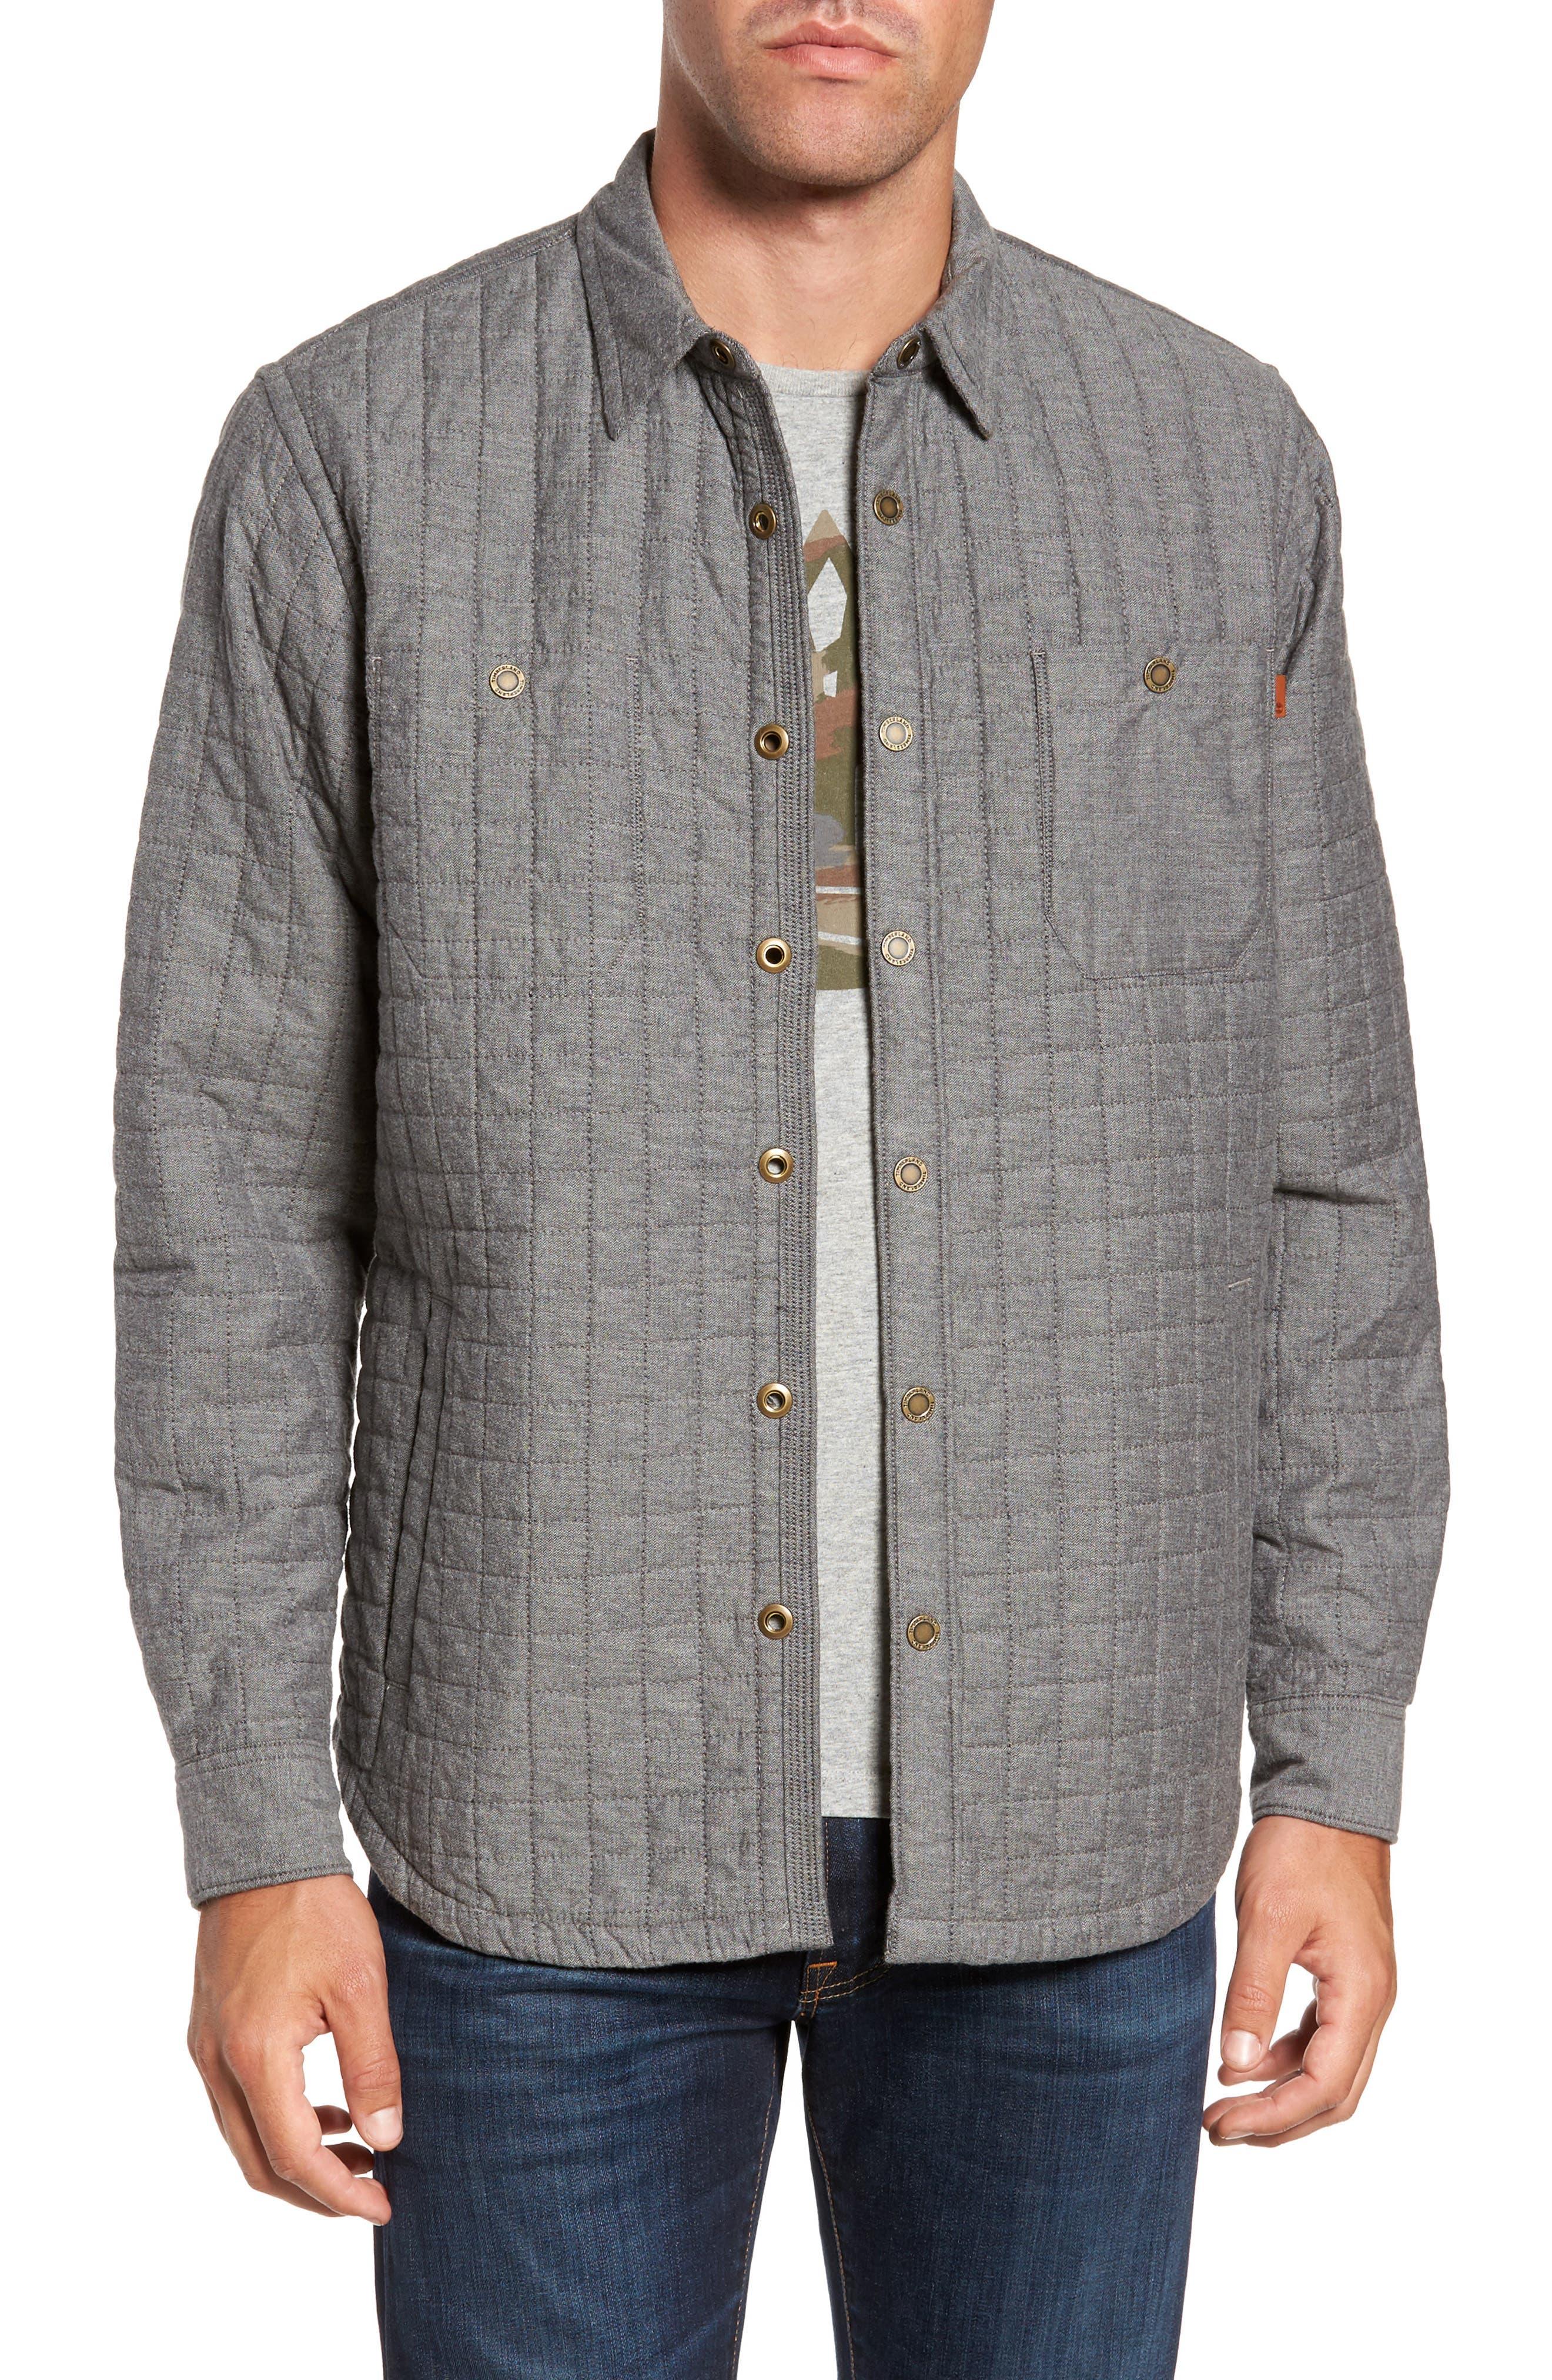 Main Image - Timberland Gunstock River Lightweight Quilted Shirt Jacket